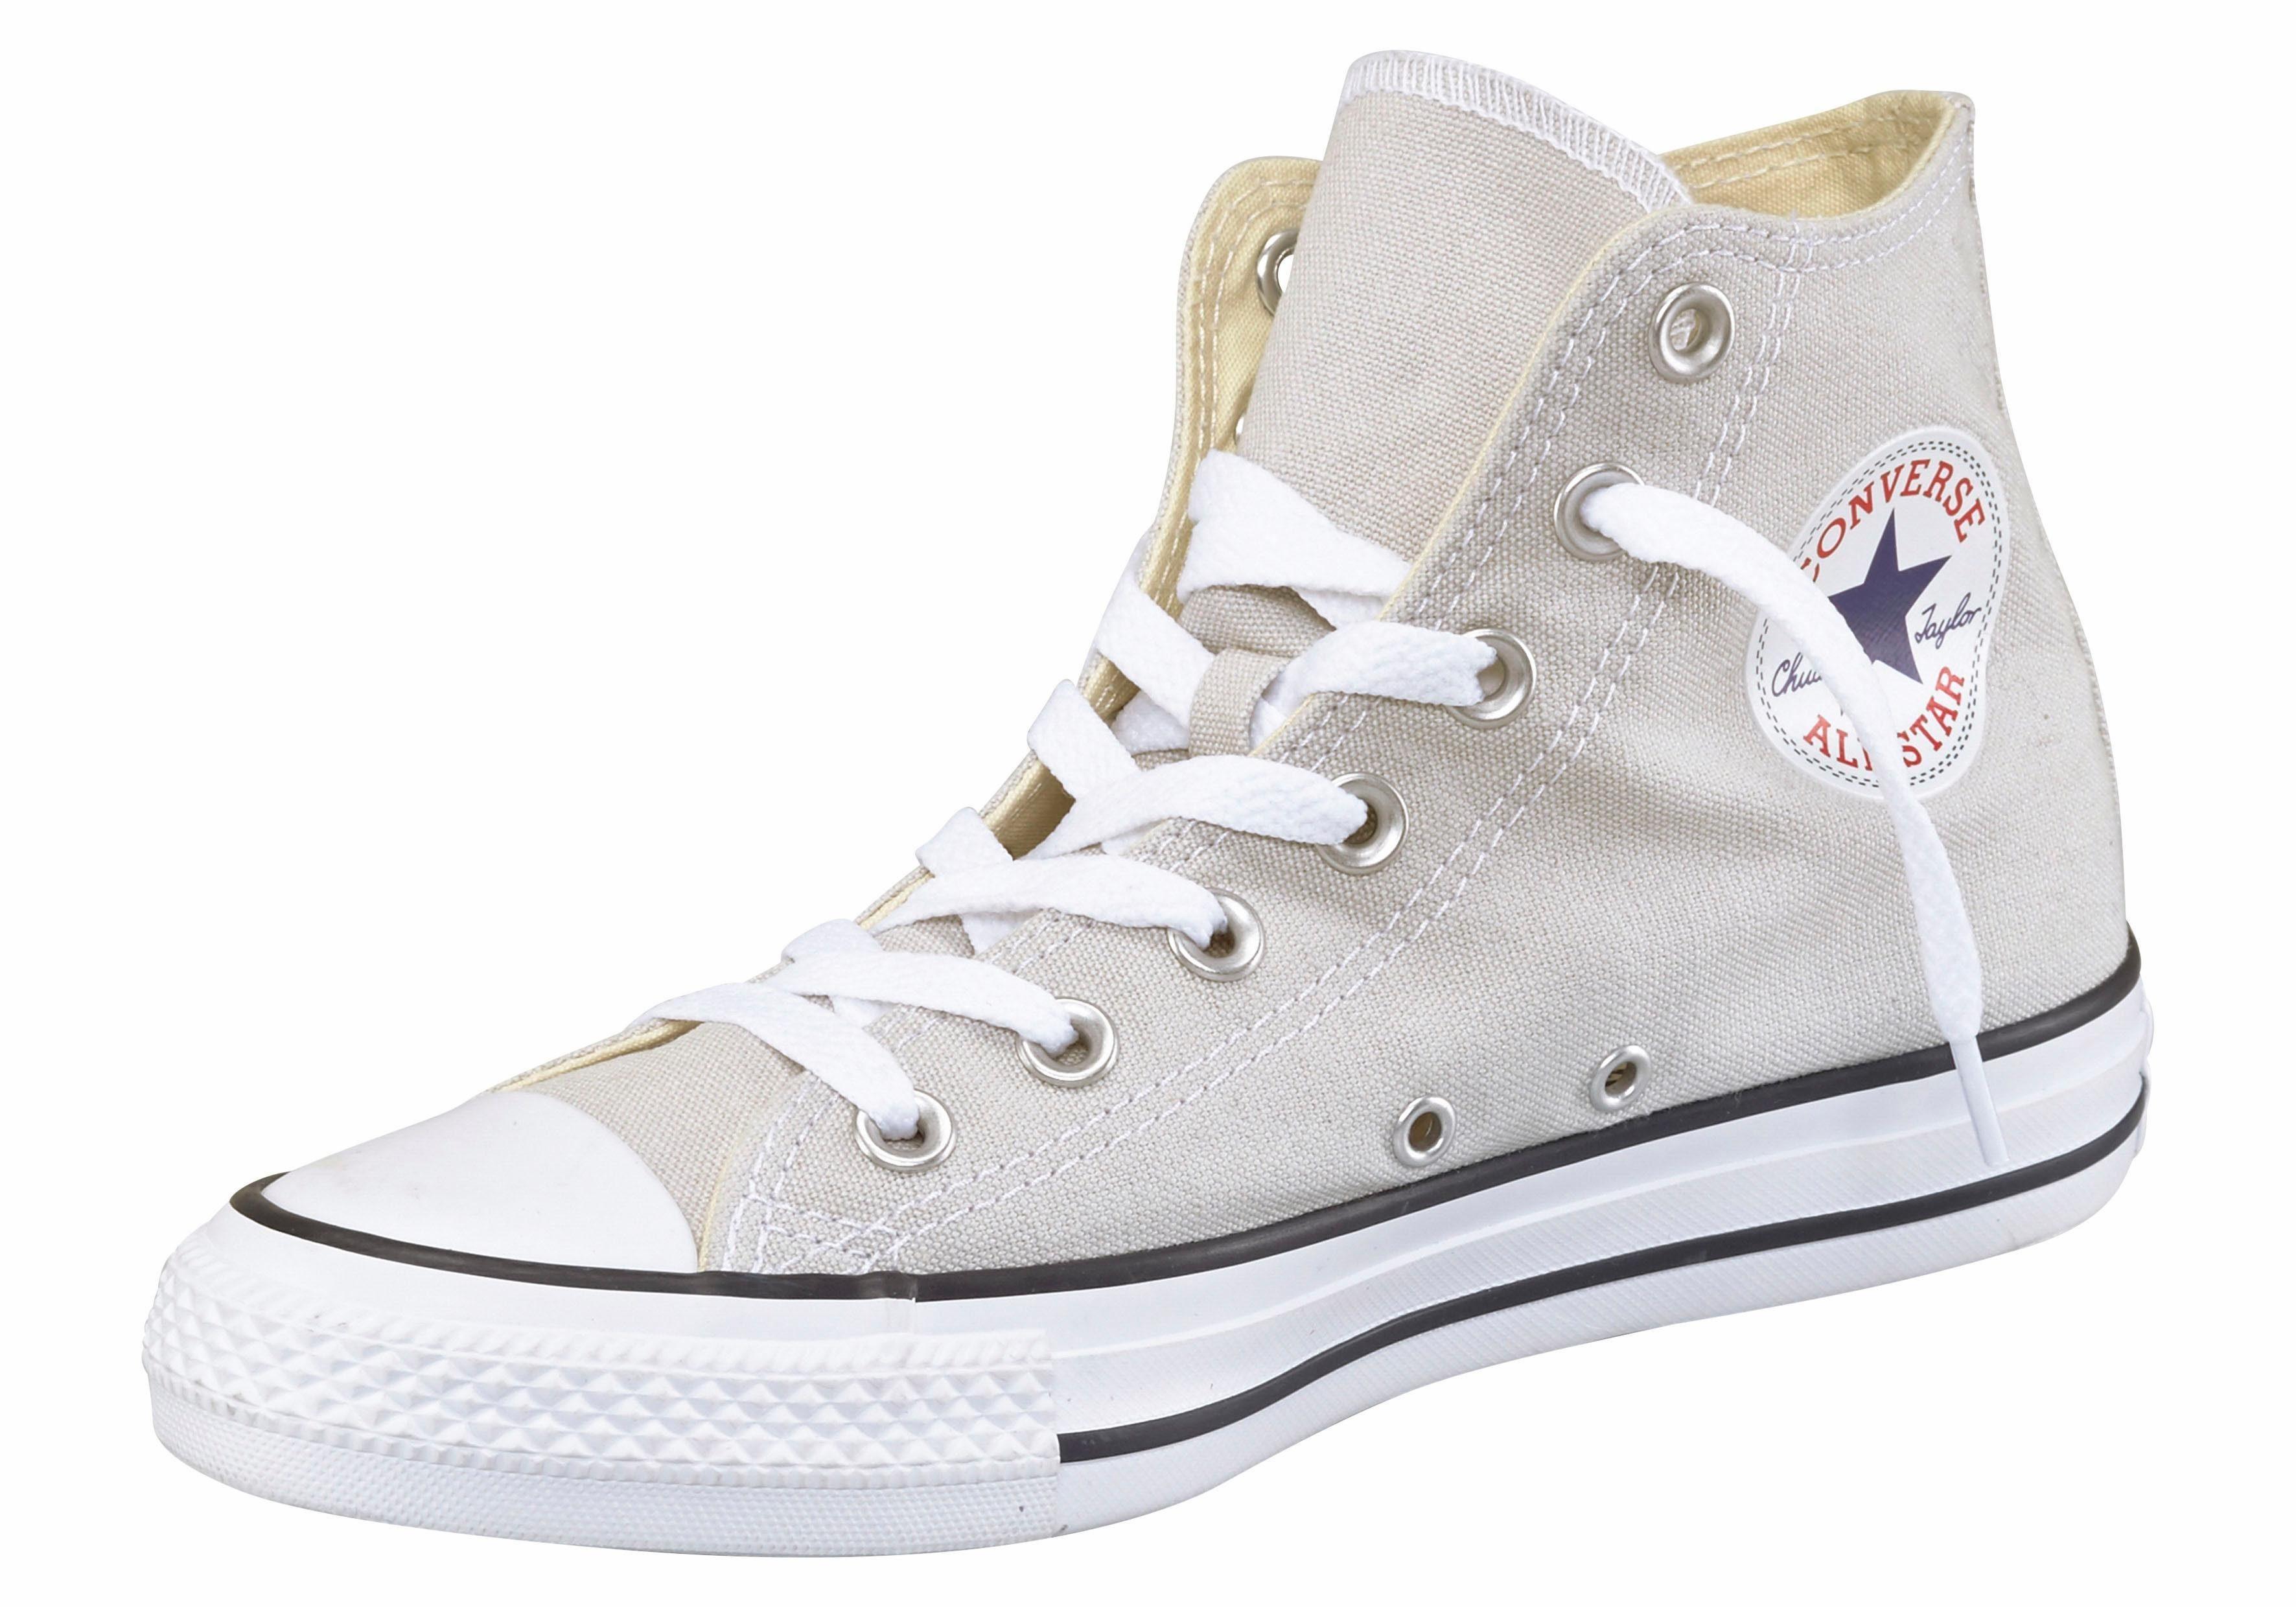 Converse Chuck Taylor All Star Hi Sneaker, Seasonal Unisex online kaufen  hellgrau